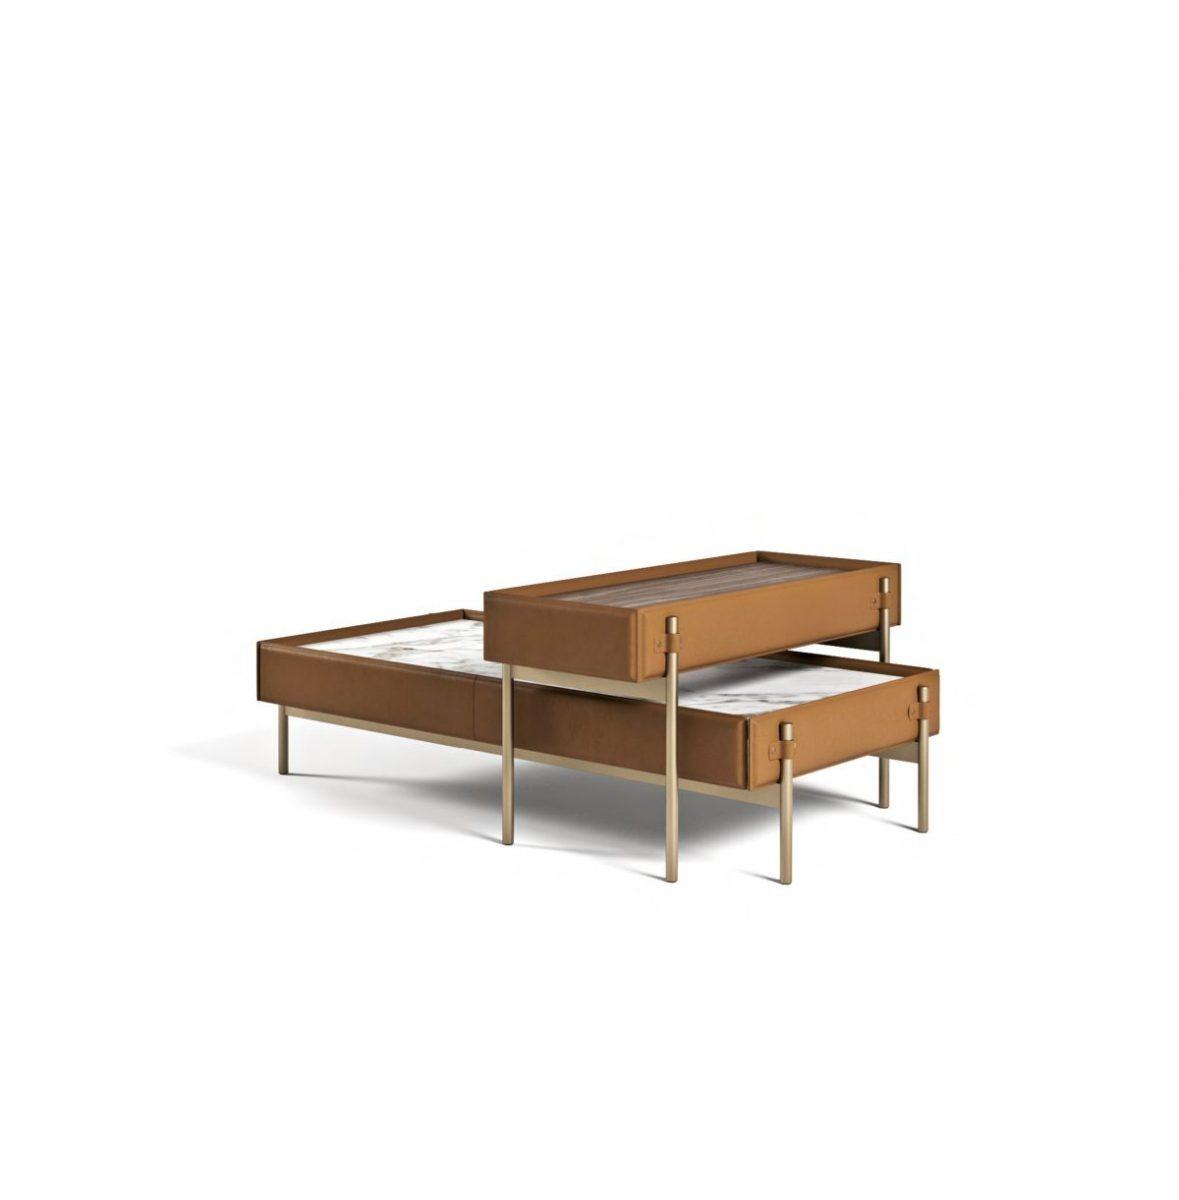 06aamartin-coffee-table-v216-1200x1200.jpg